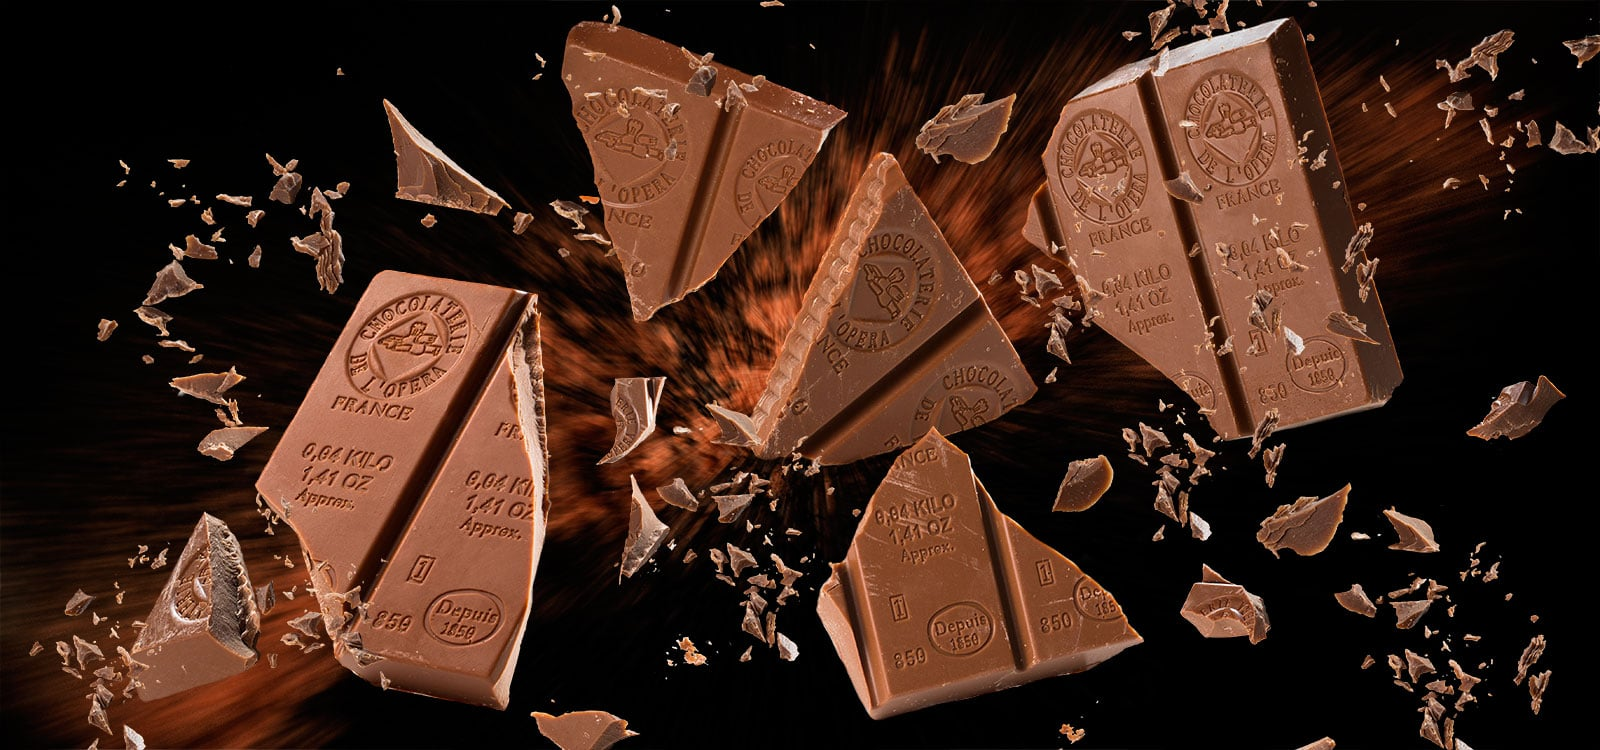 tablette-chocolat_eclatee_ovomaltine